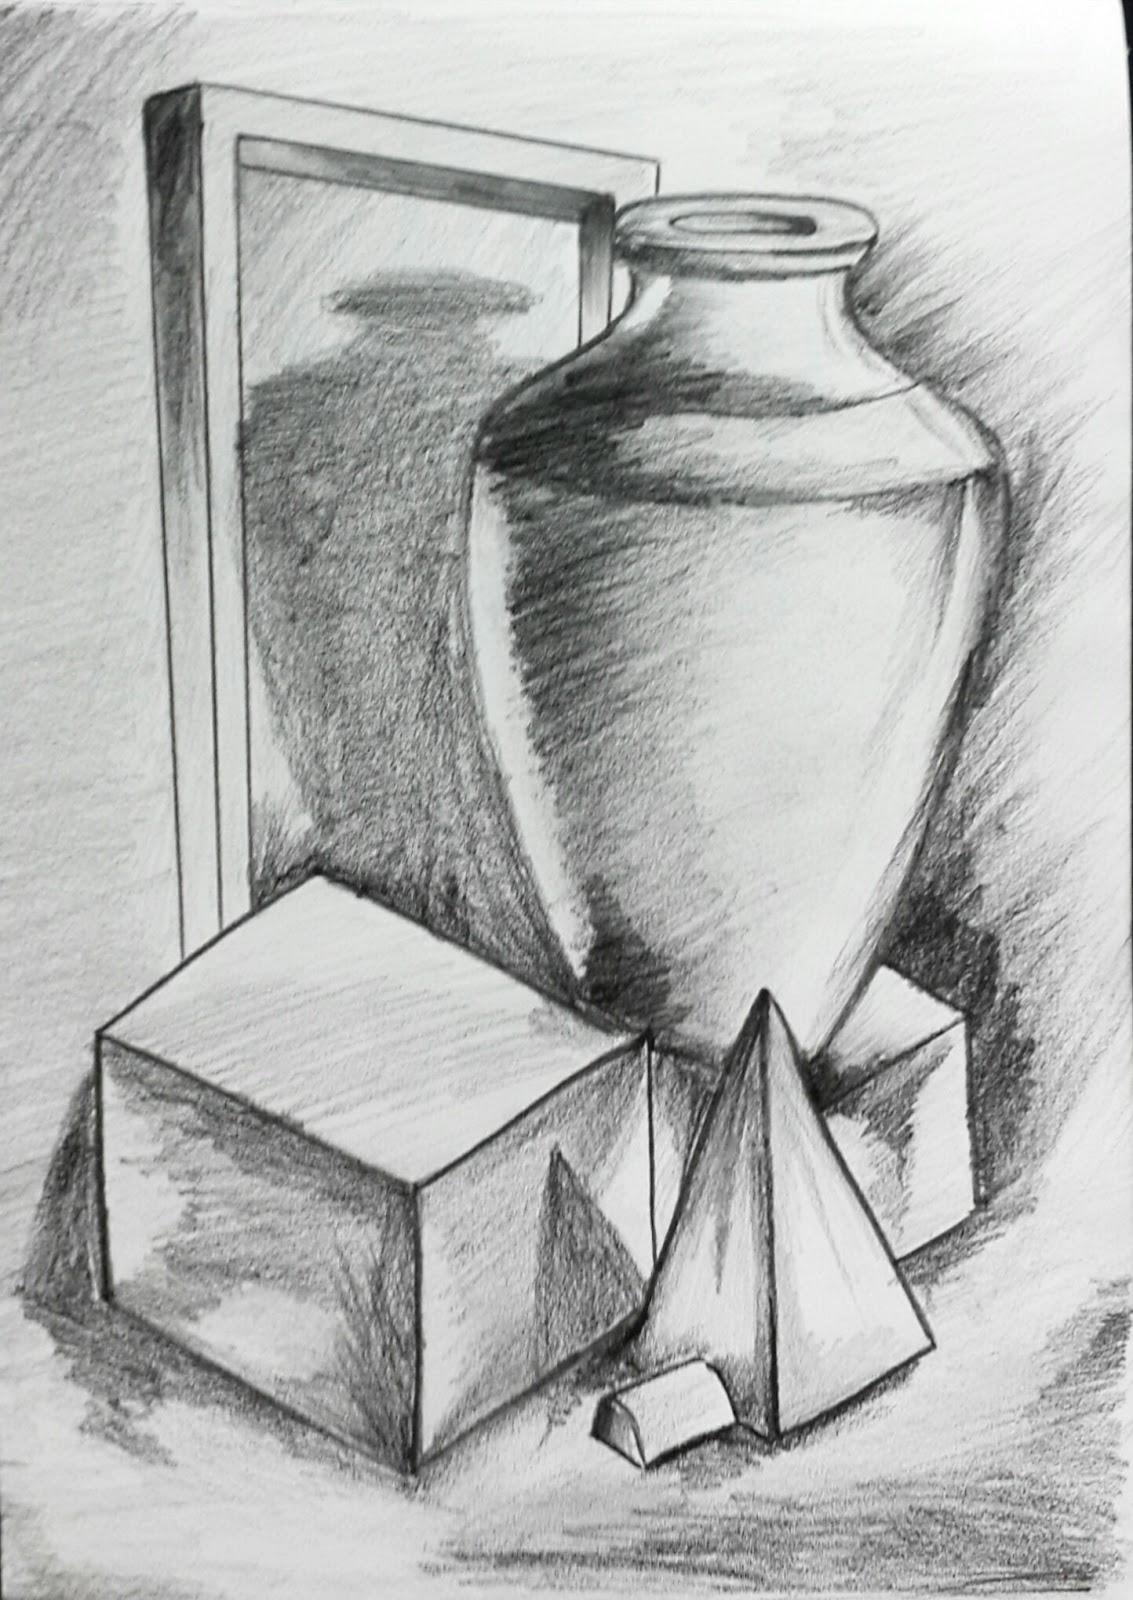 Thanush.Kr: Object; Drawing 3D pencil shading